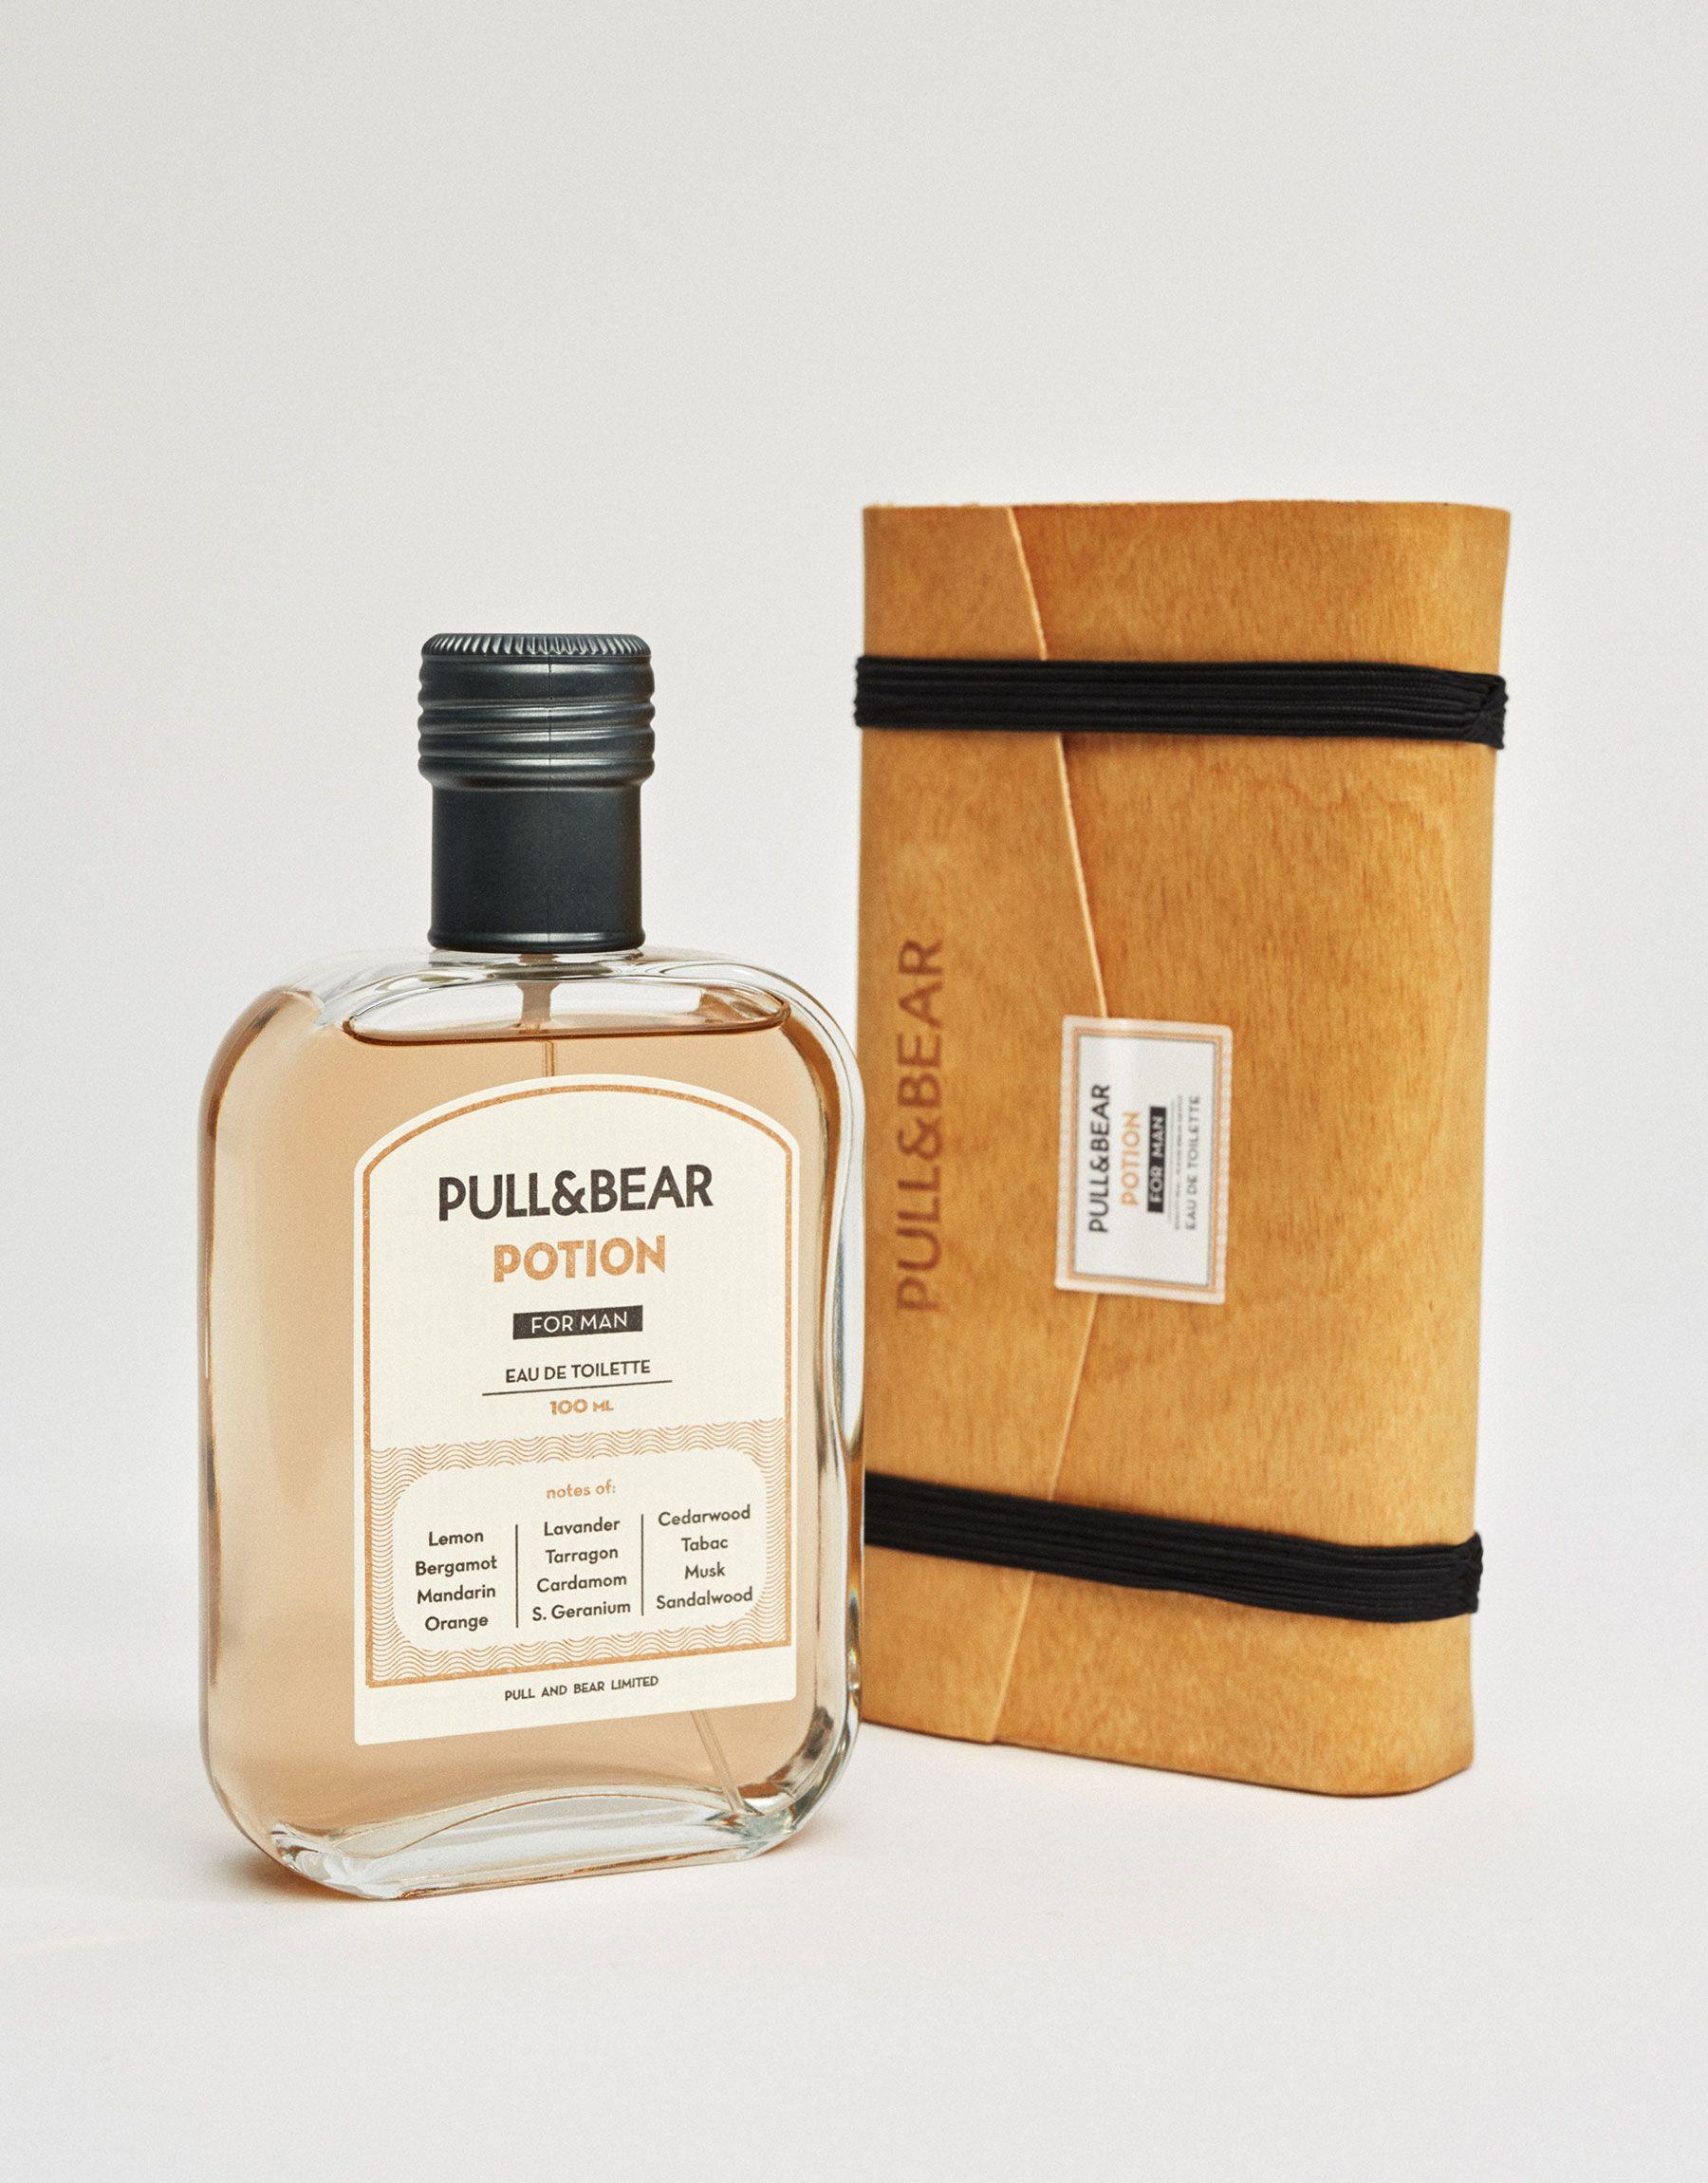 61a35e426 Eau de toilette pull   bear potion man 100 ml - Fragrâncias - Complementos  - Homem